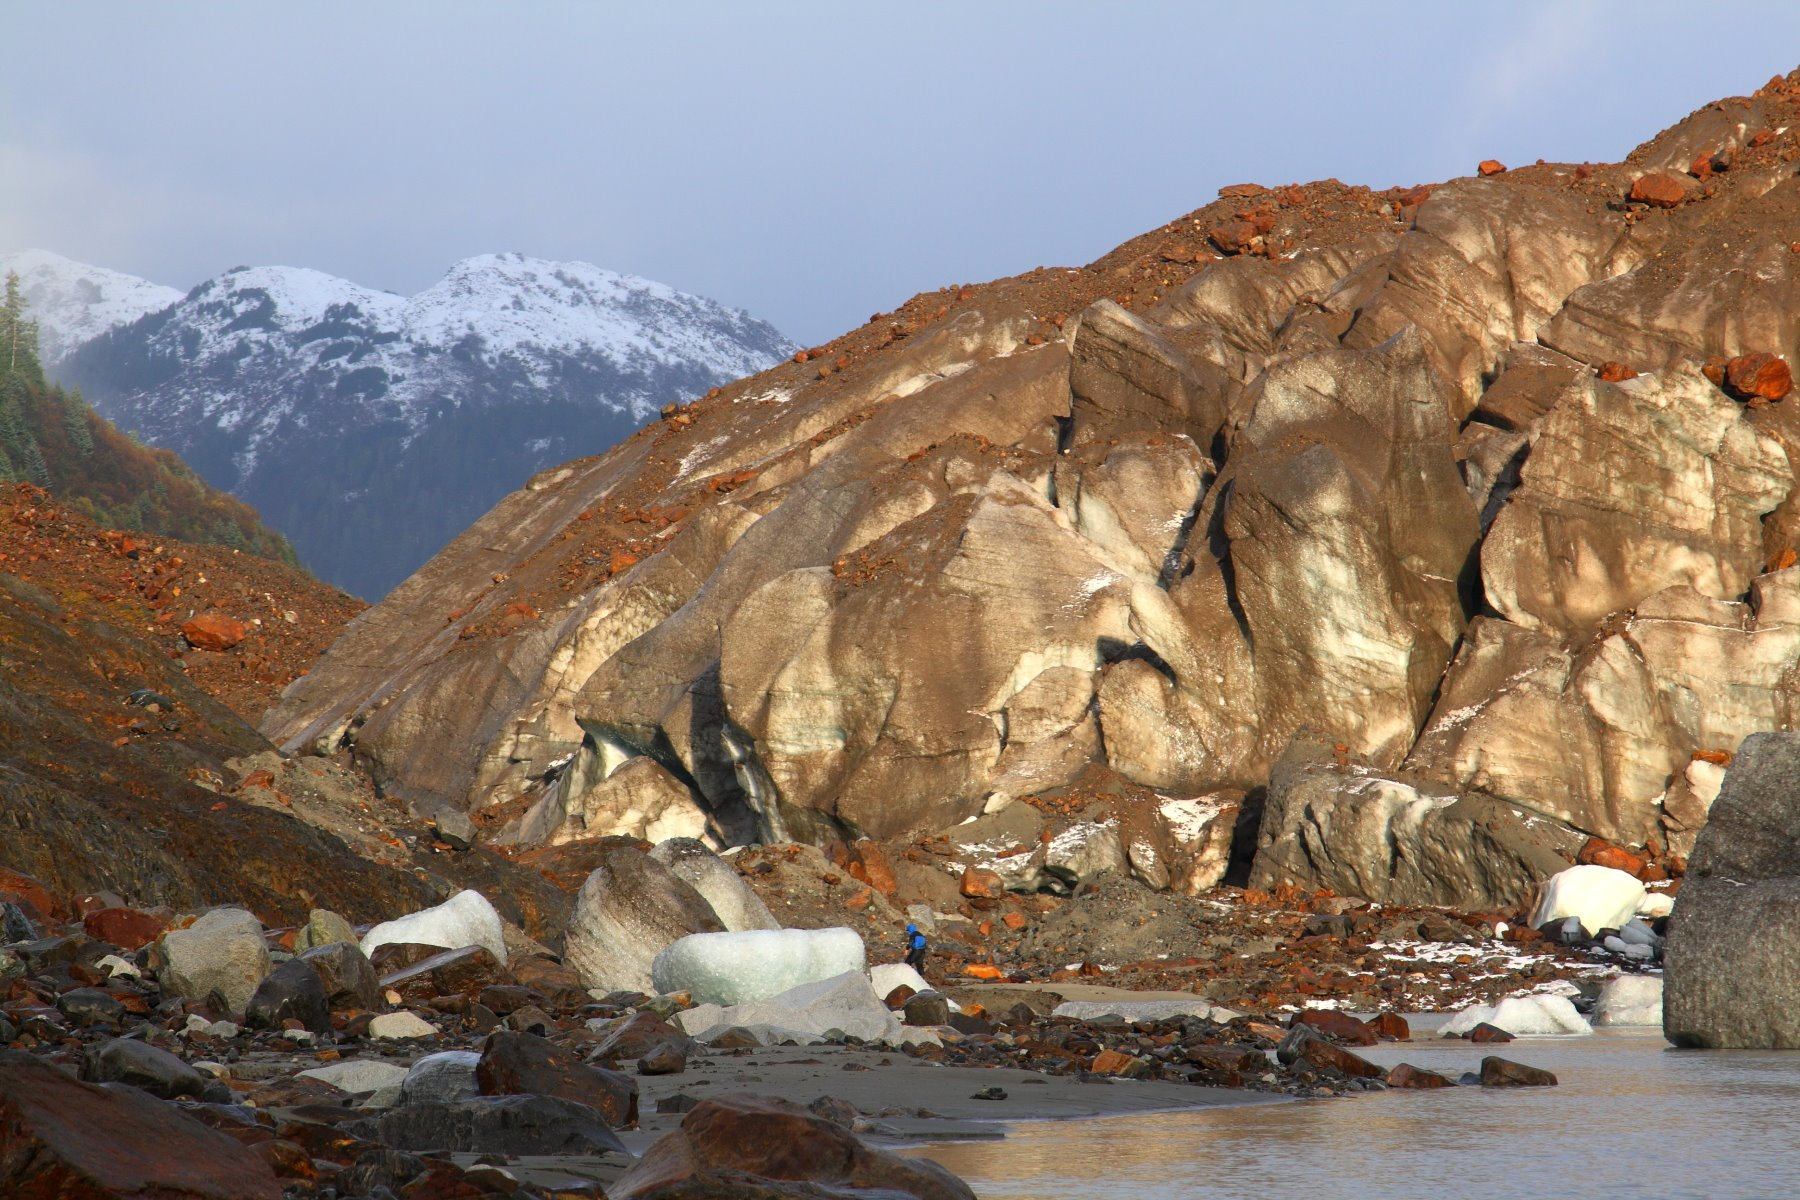 Brady Glacier - As the ice retreats, it provides a narrow passage to walk along its side.